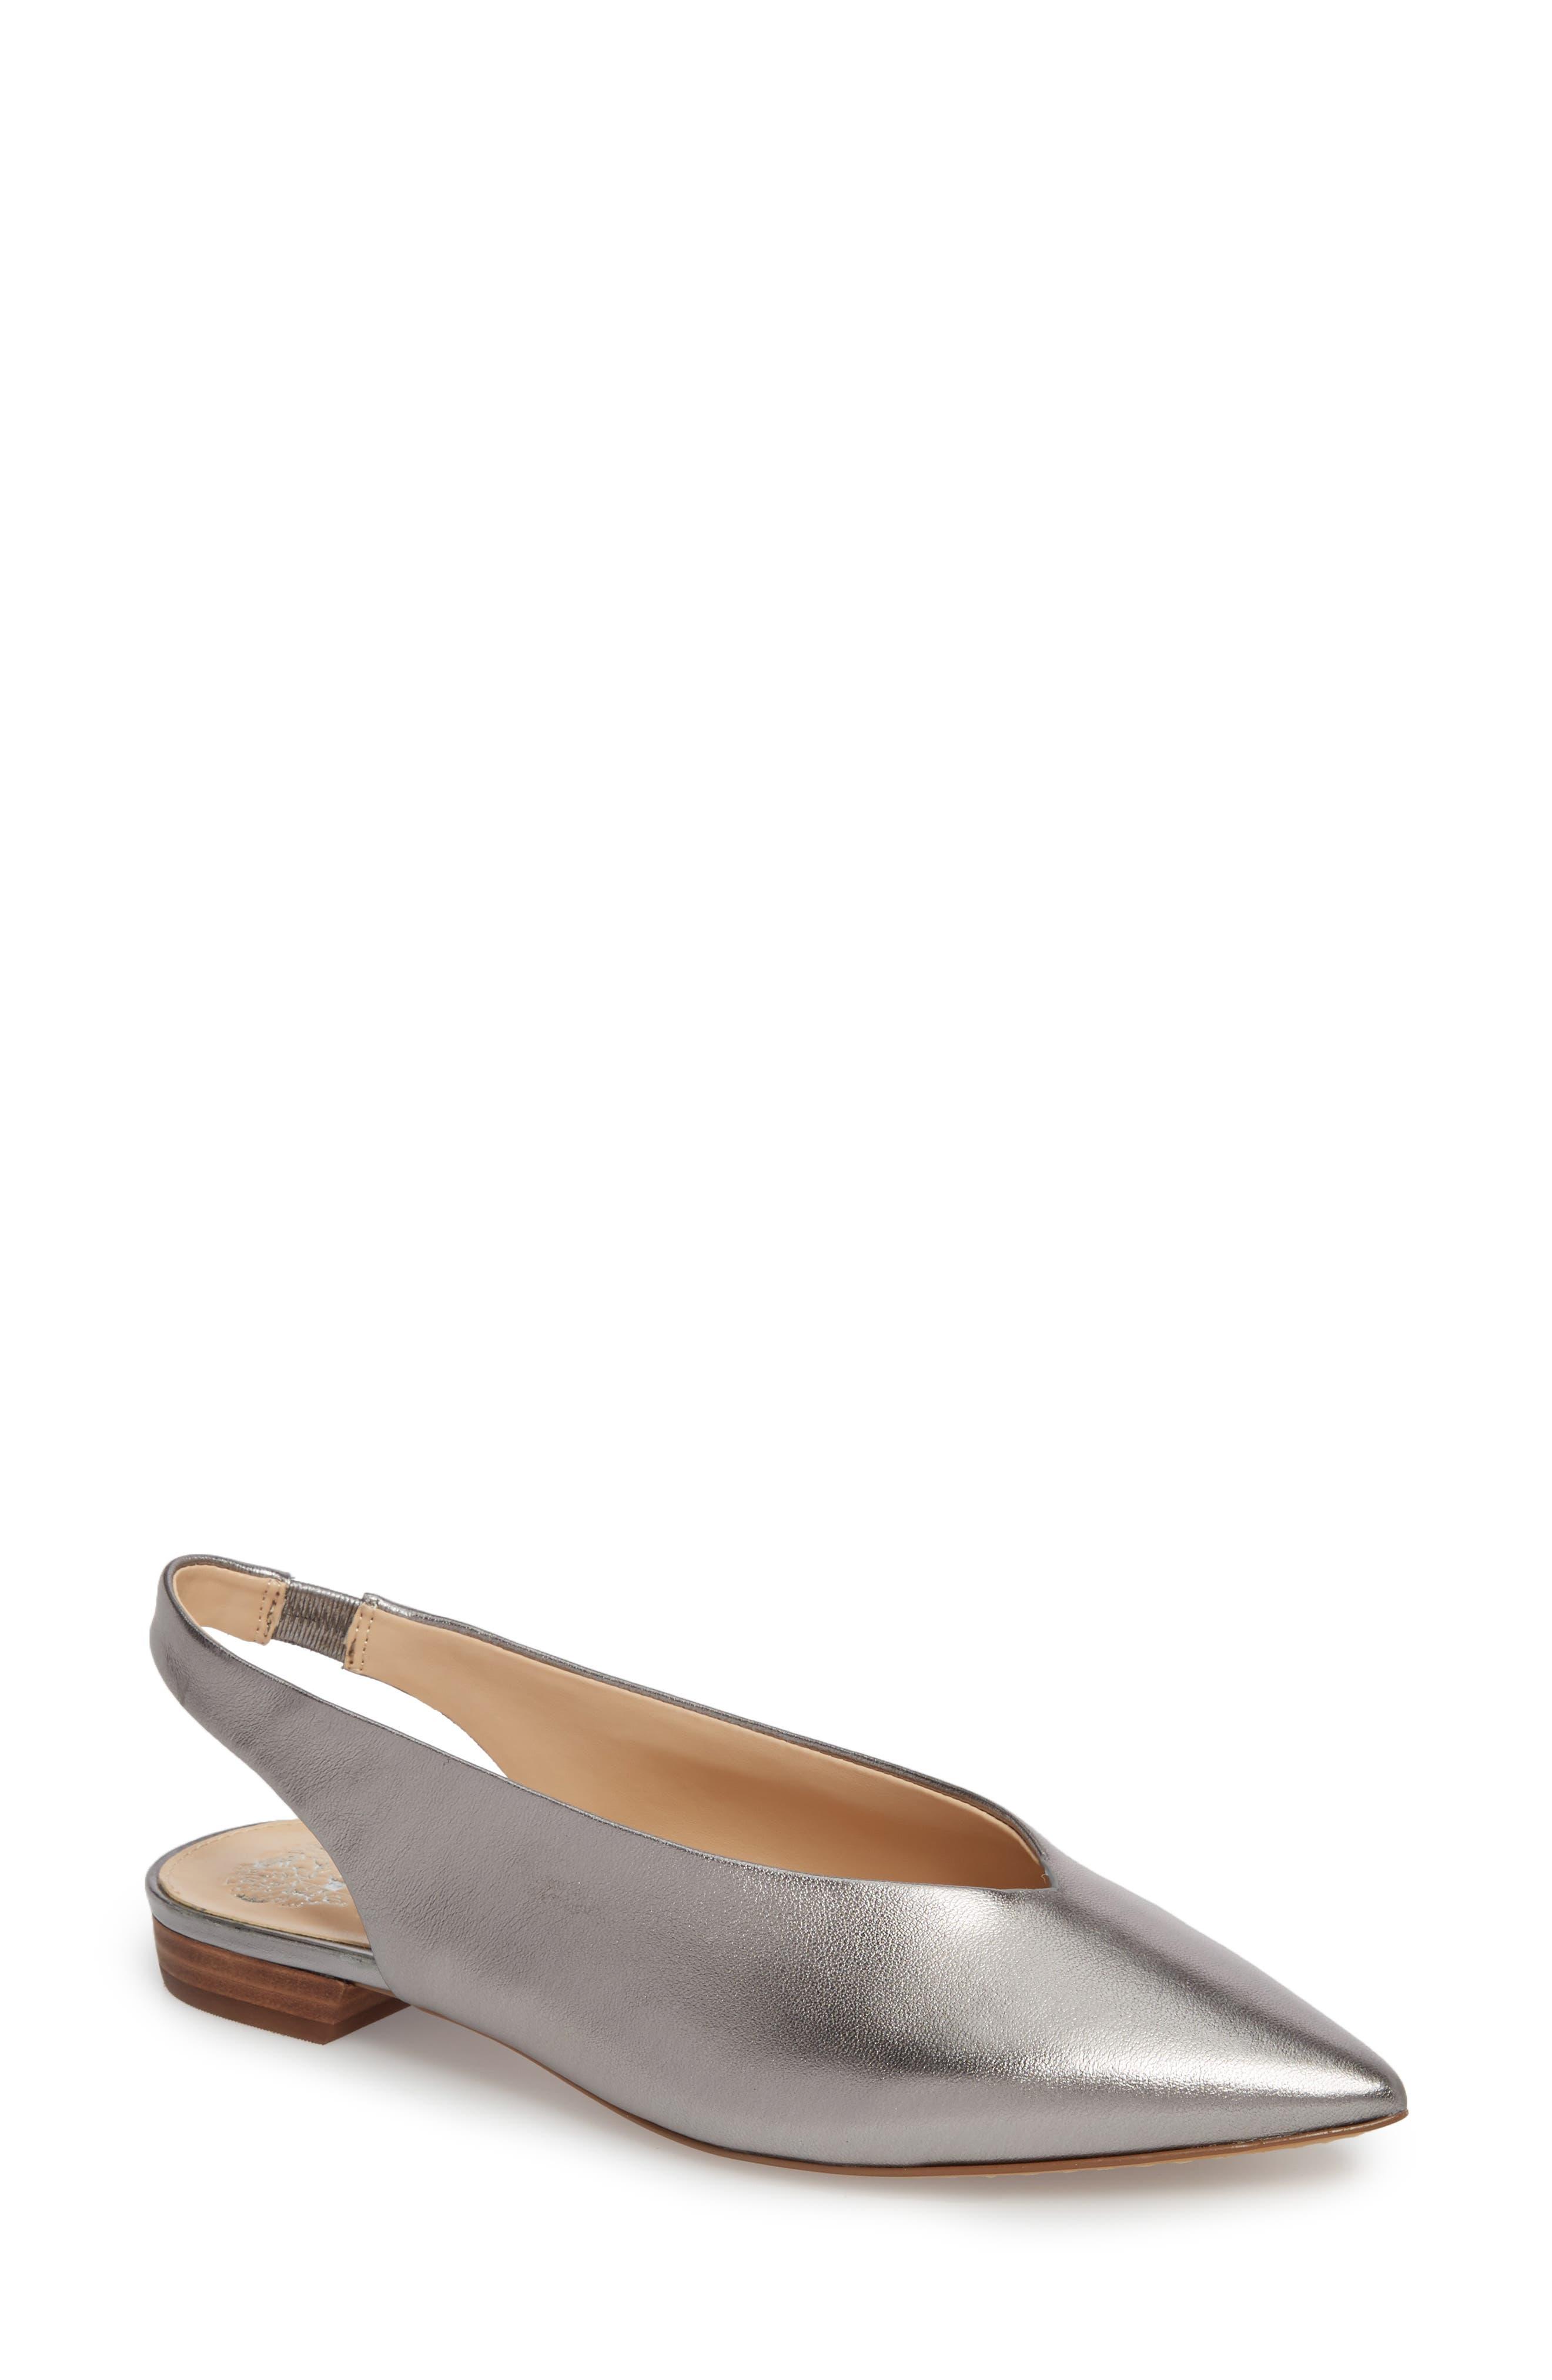 Matilda Slingback Flat,                             Main thumbnail 1, color,                             Radiant Silver Leather